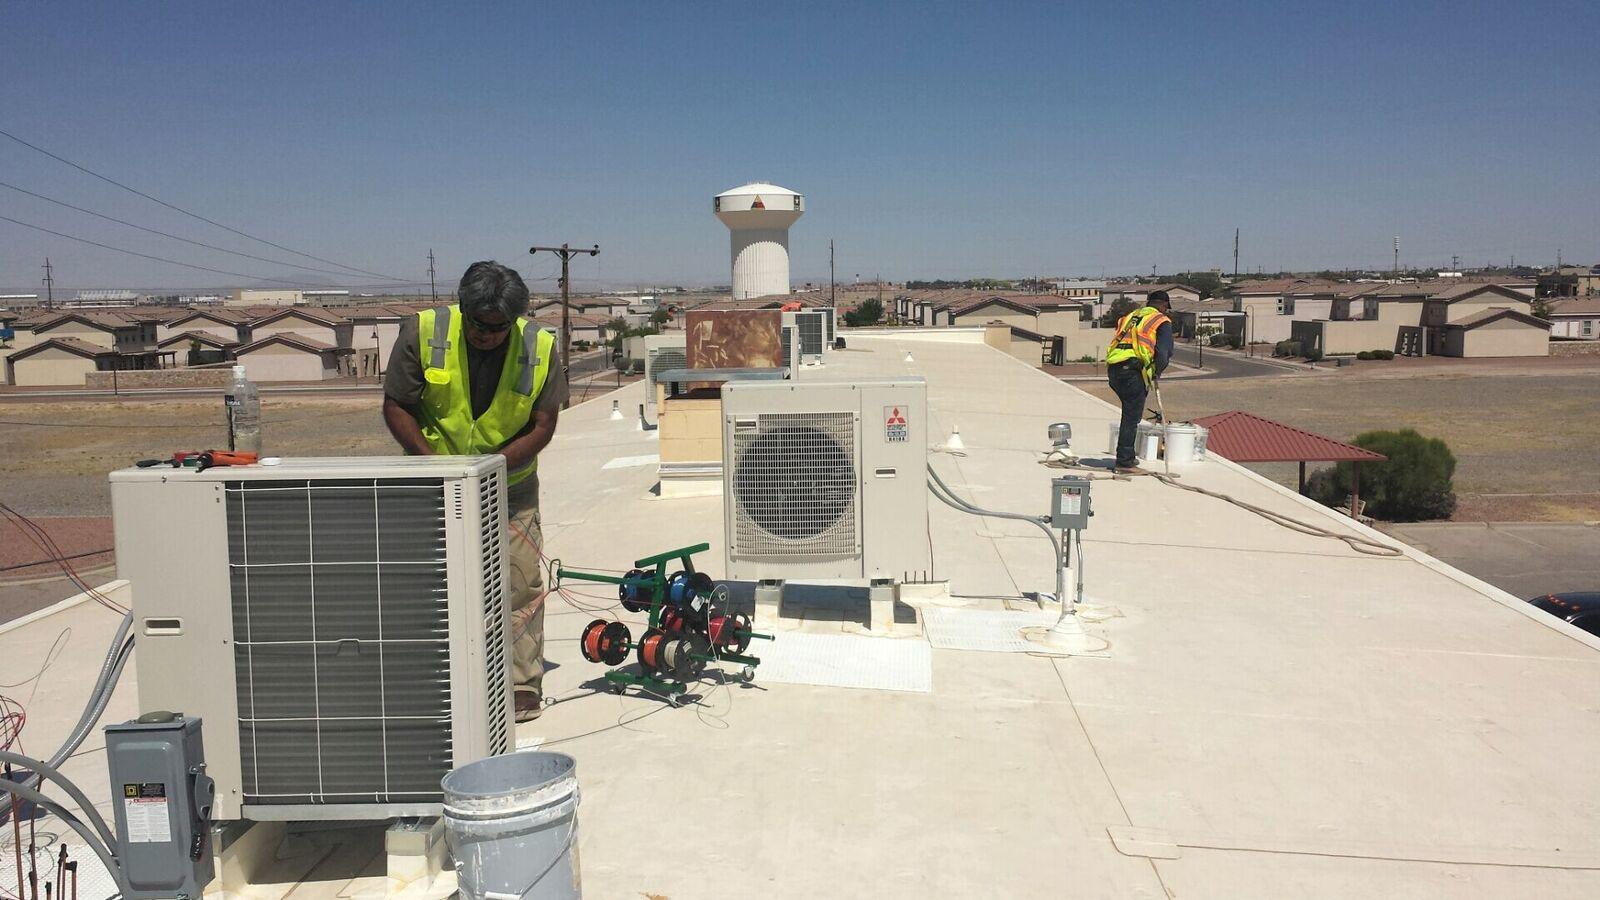 Professional Roofers & Contractors image 5